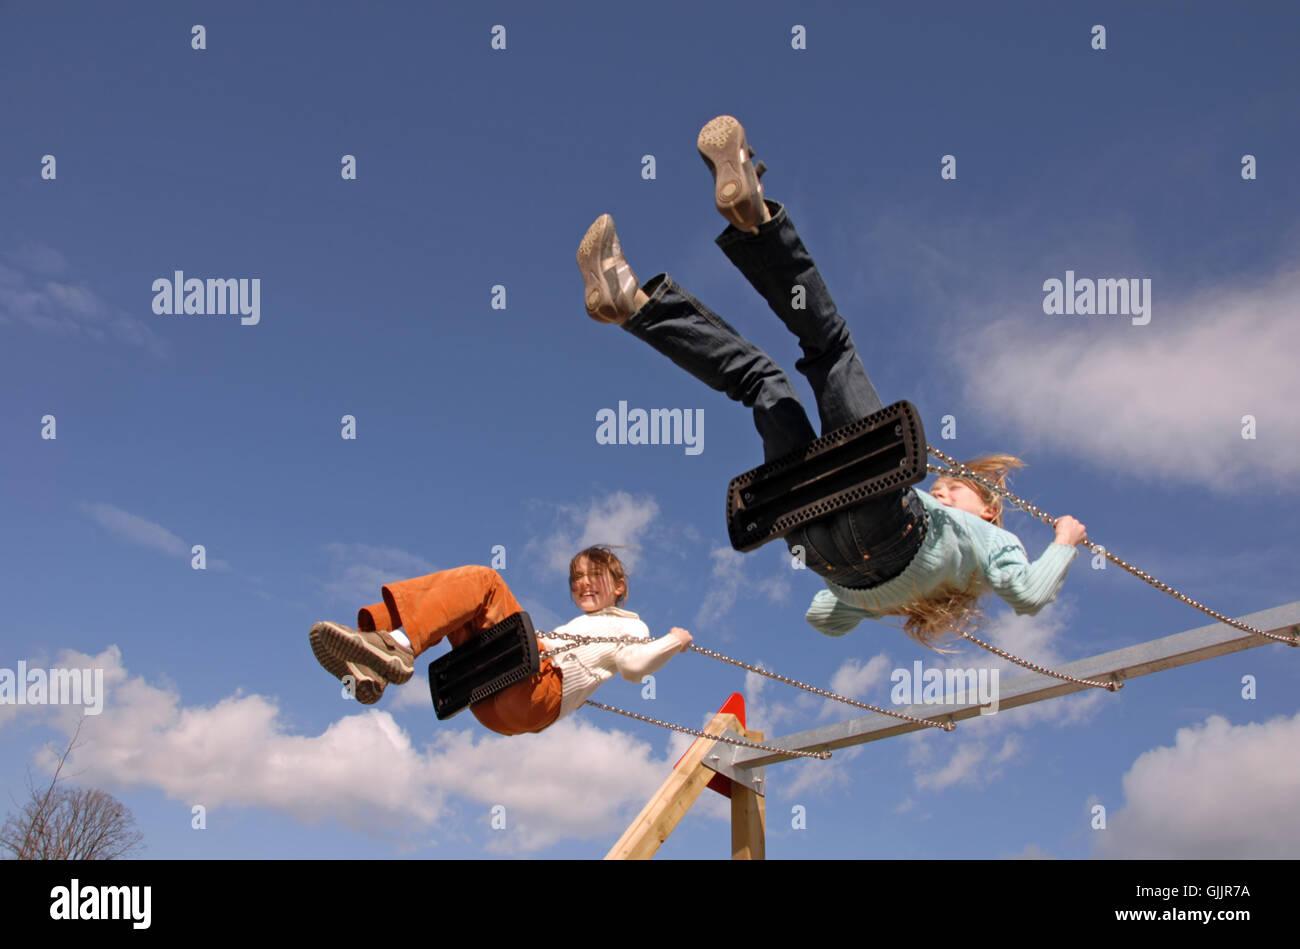 skyhigh - Stock Image